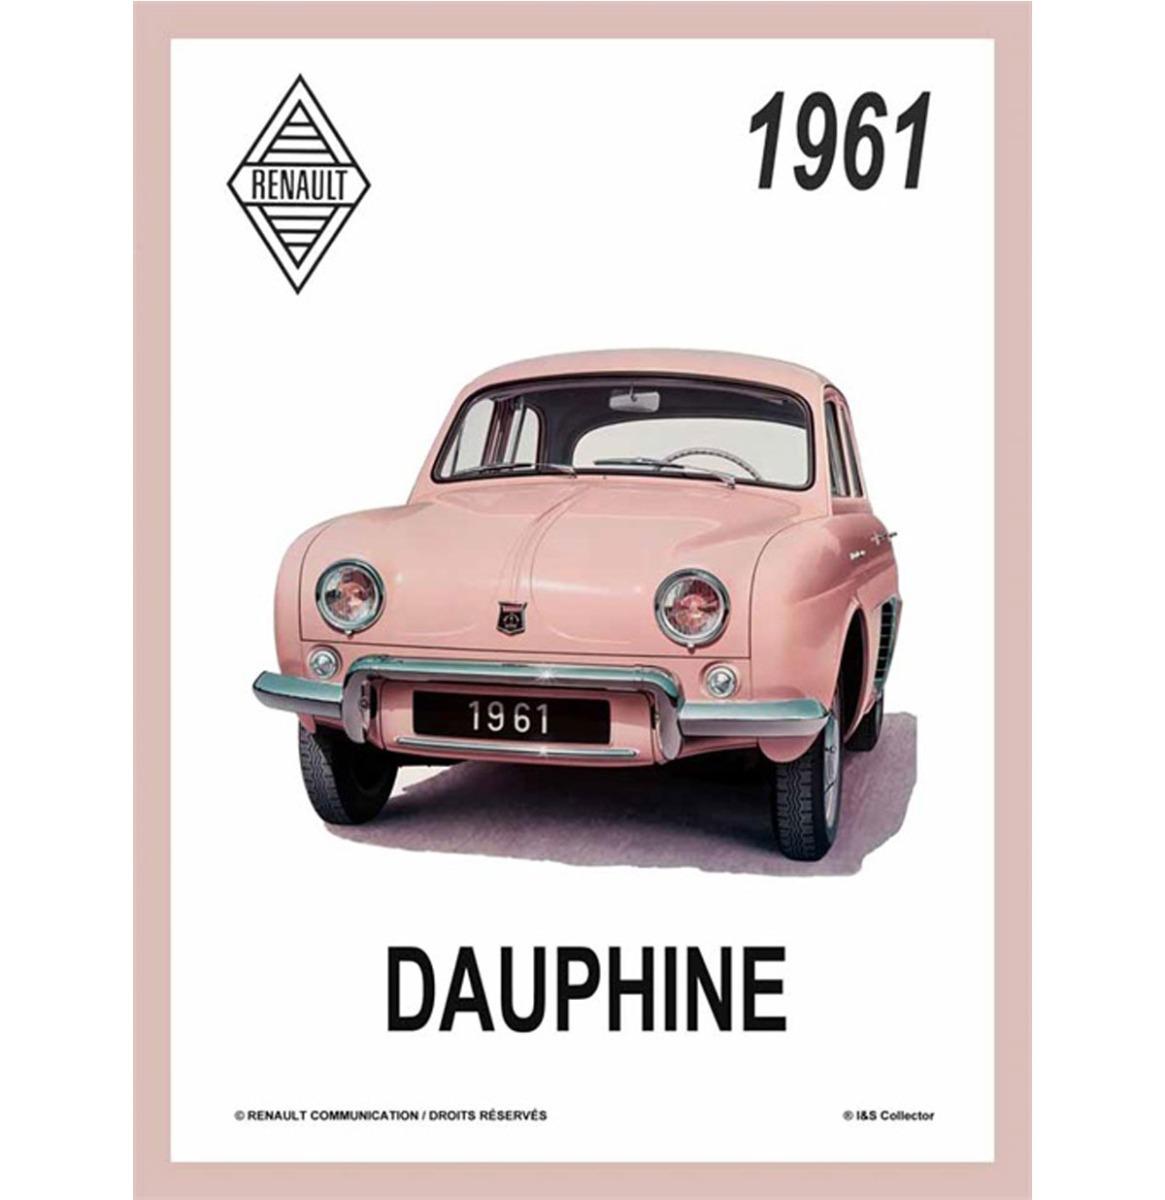 Metalen Bord 30x40 Renault Dauphine Affiche